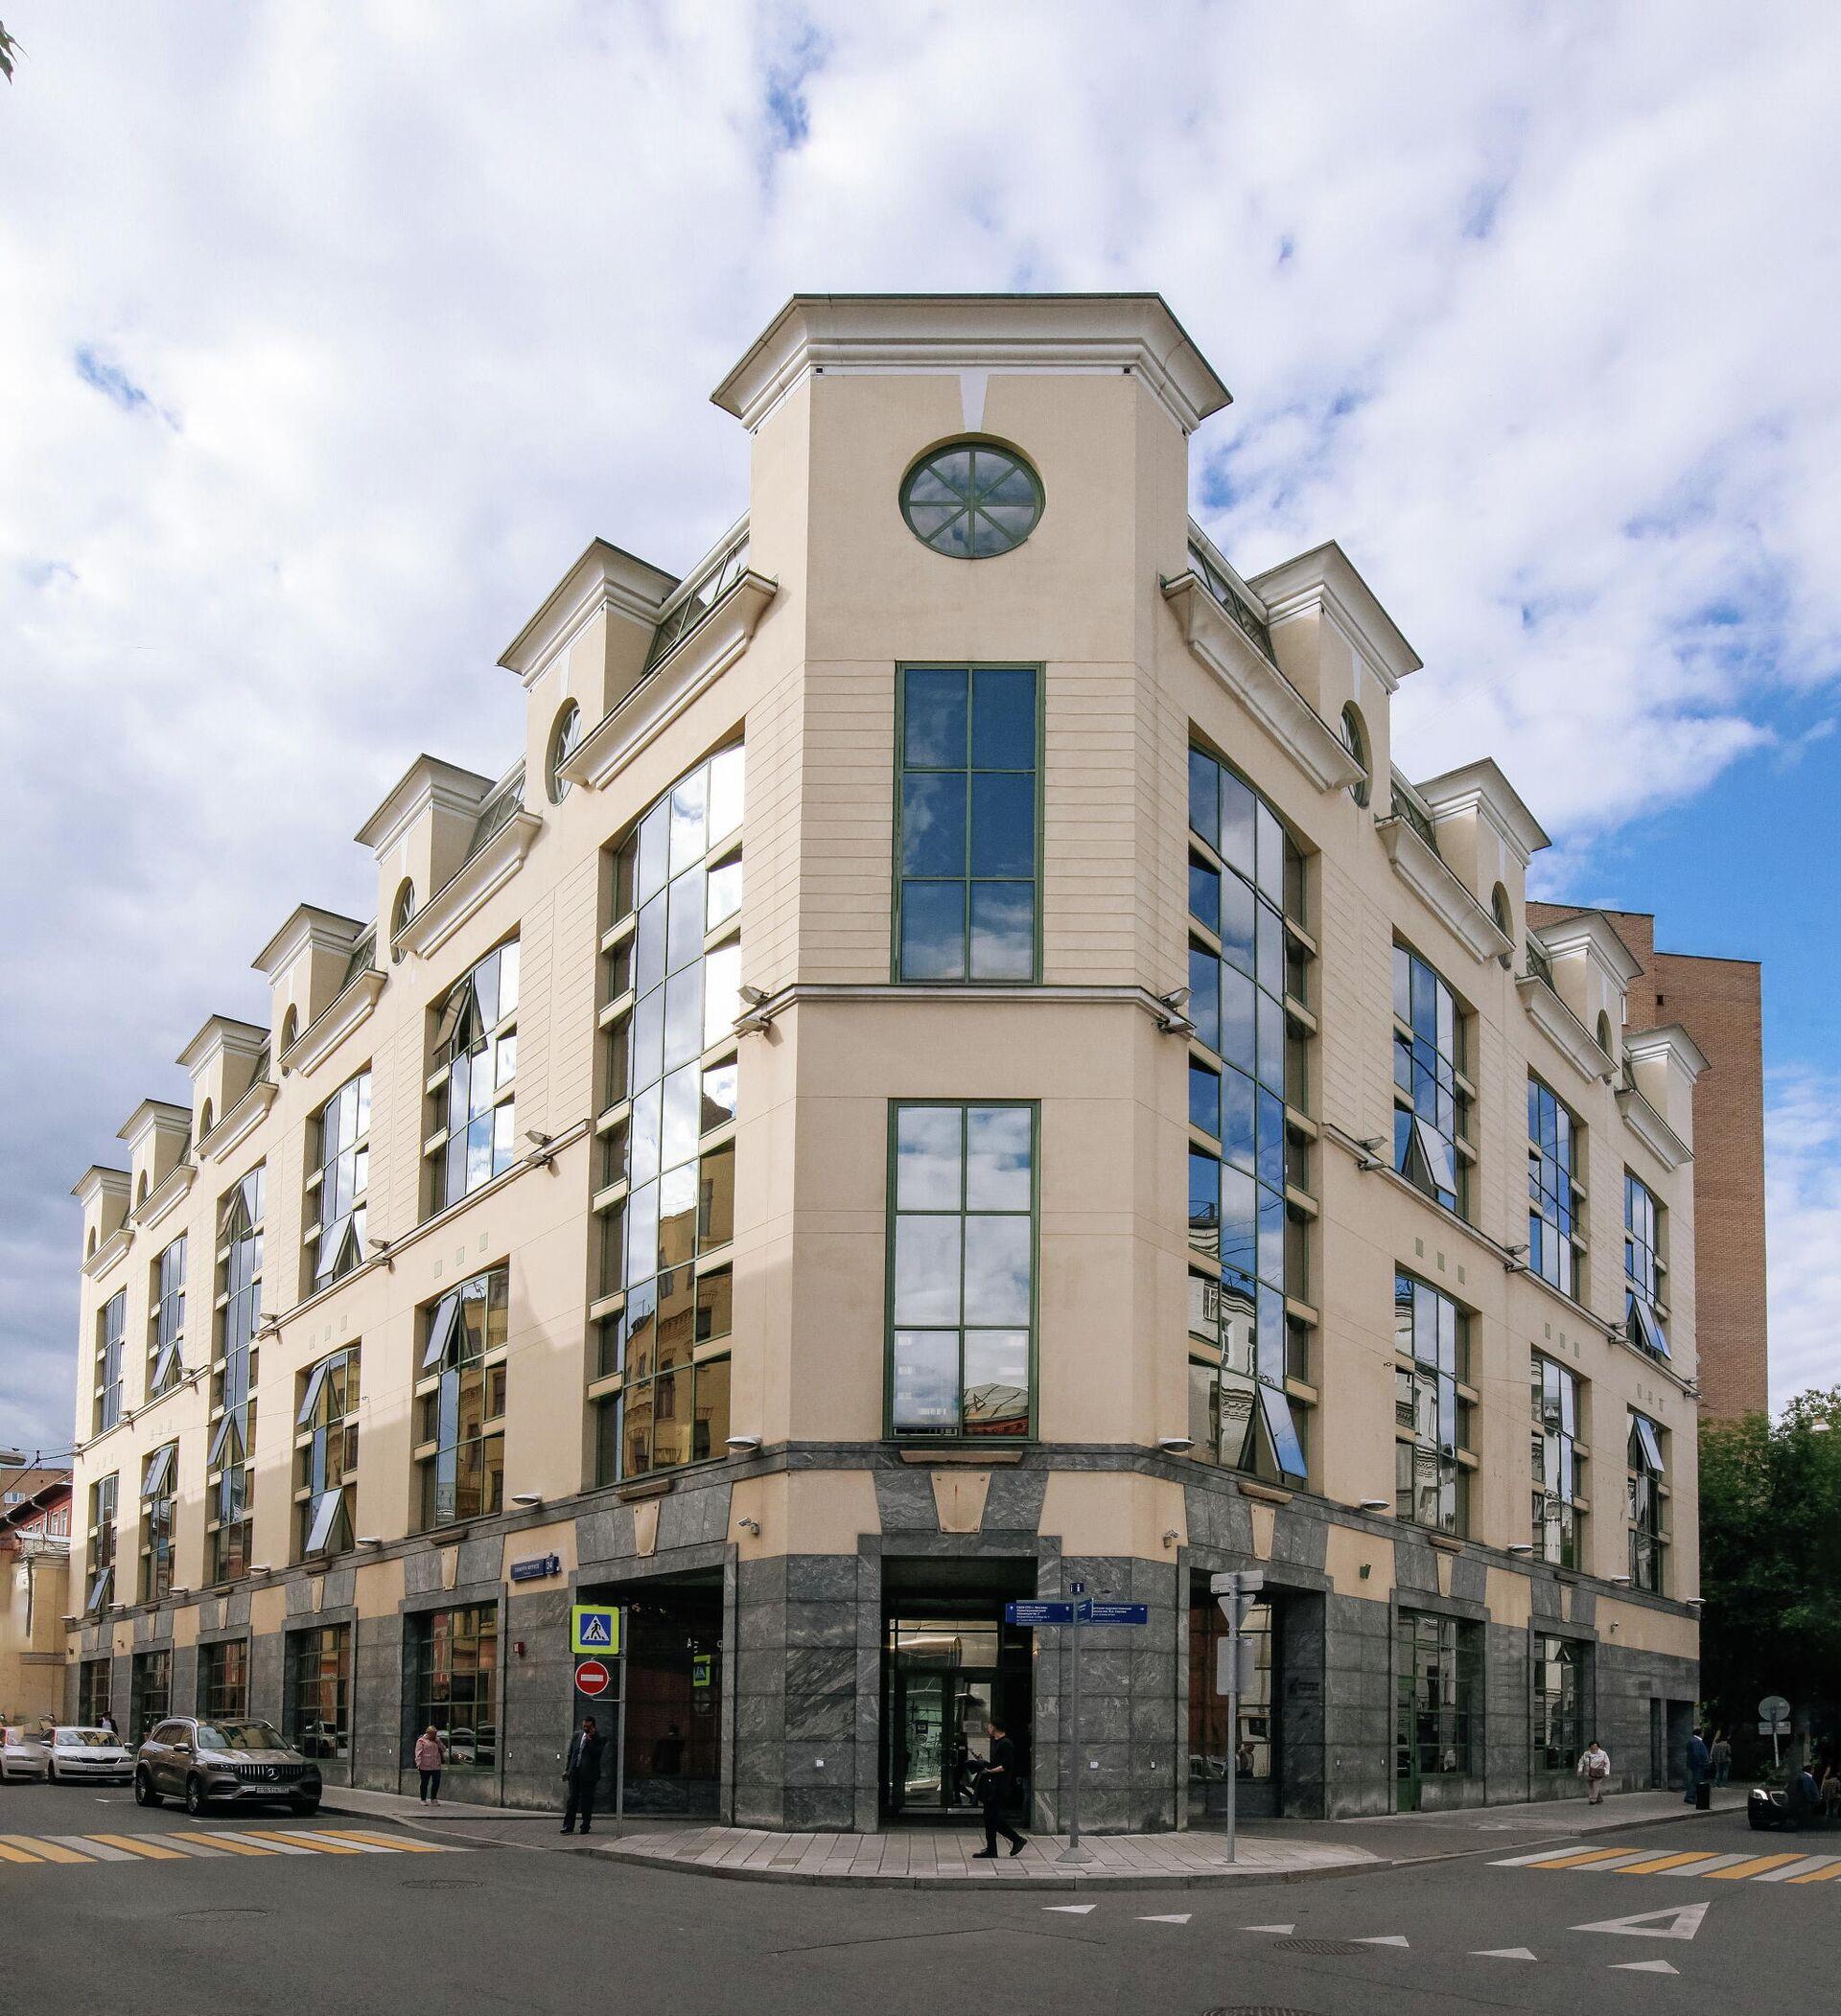 Здание БЦ Ринко Плаза, штаб-квартира СПбМТСБ - РИА Новости, 1920, 08.10.2021